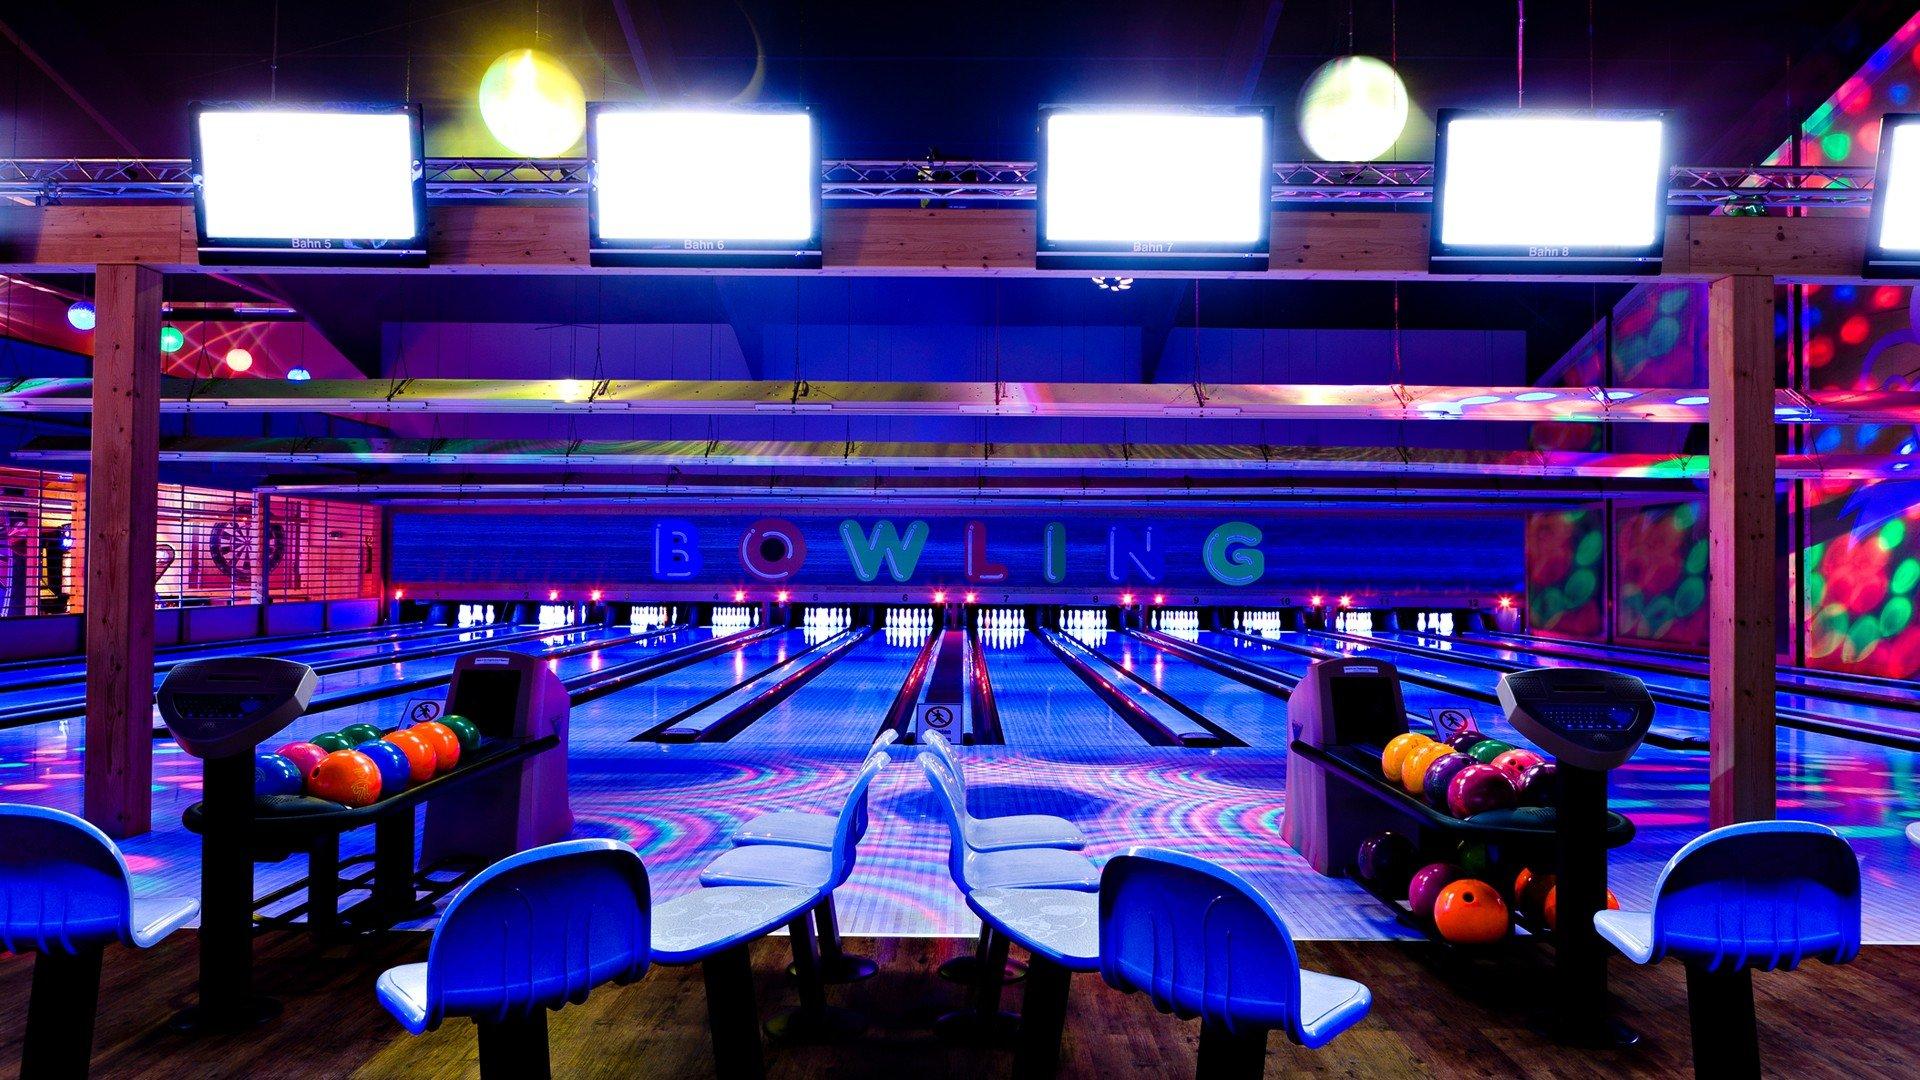 Bowling Entertainment Ball Lane Black Lighting Wallpaper